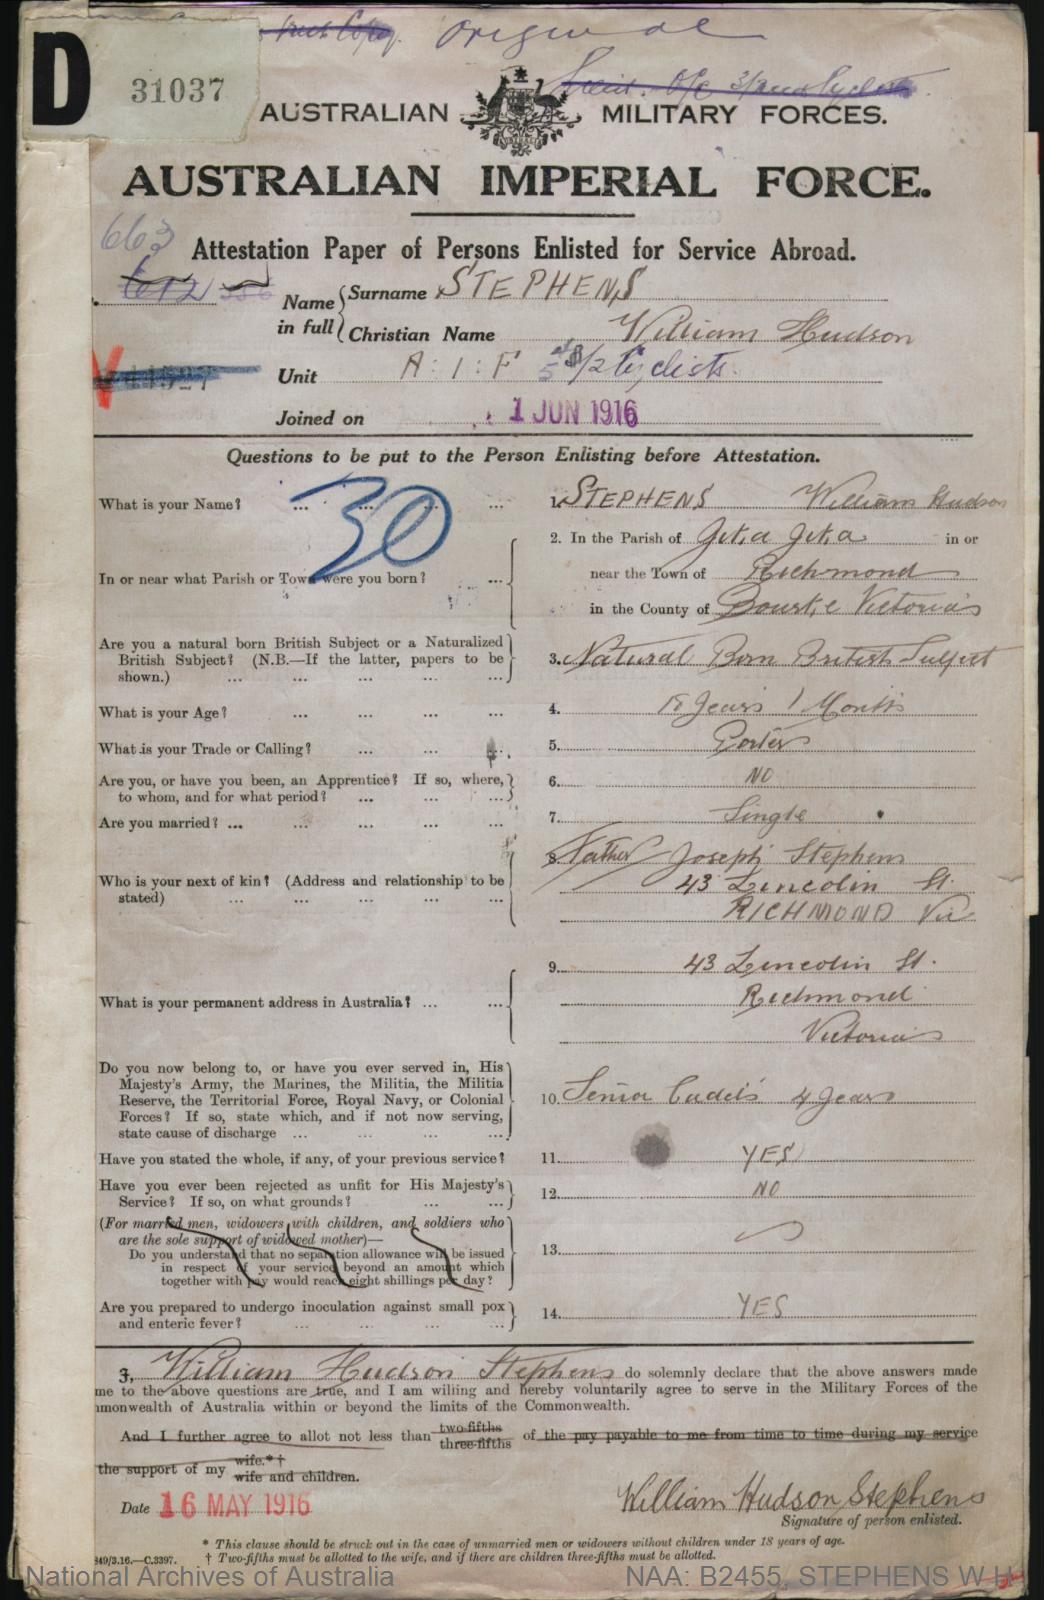 Stephens William Hudson : SERN 633A : POB Melbourne VIC : POE Melbourne VIC : NOK F Stephens Joseph